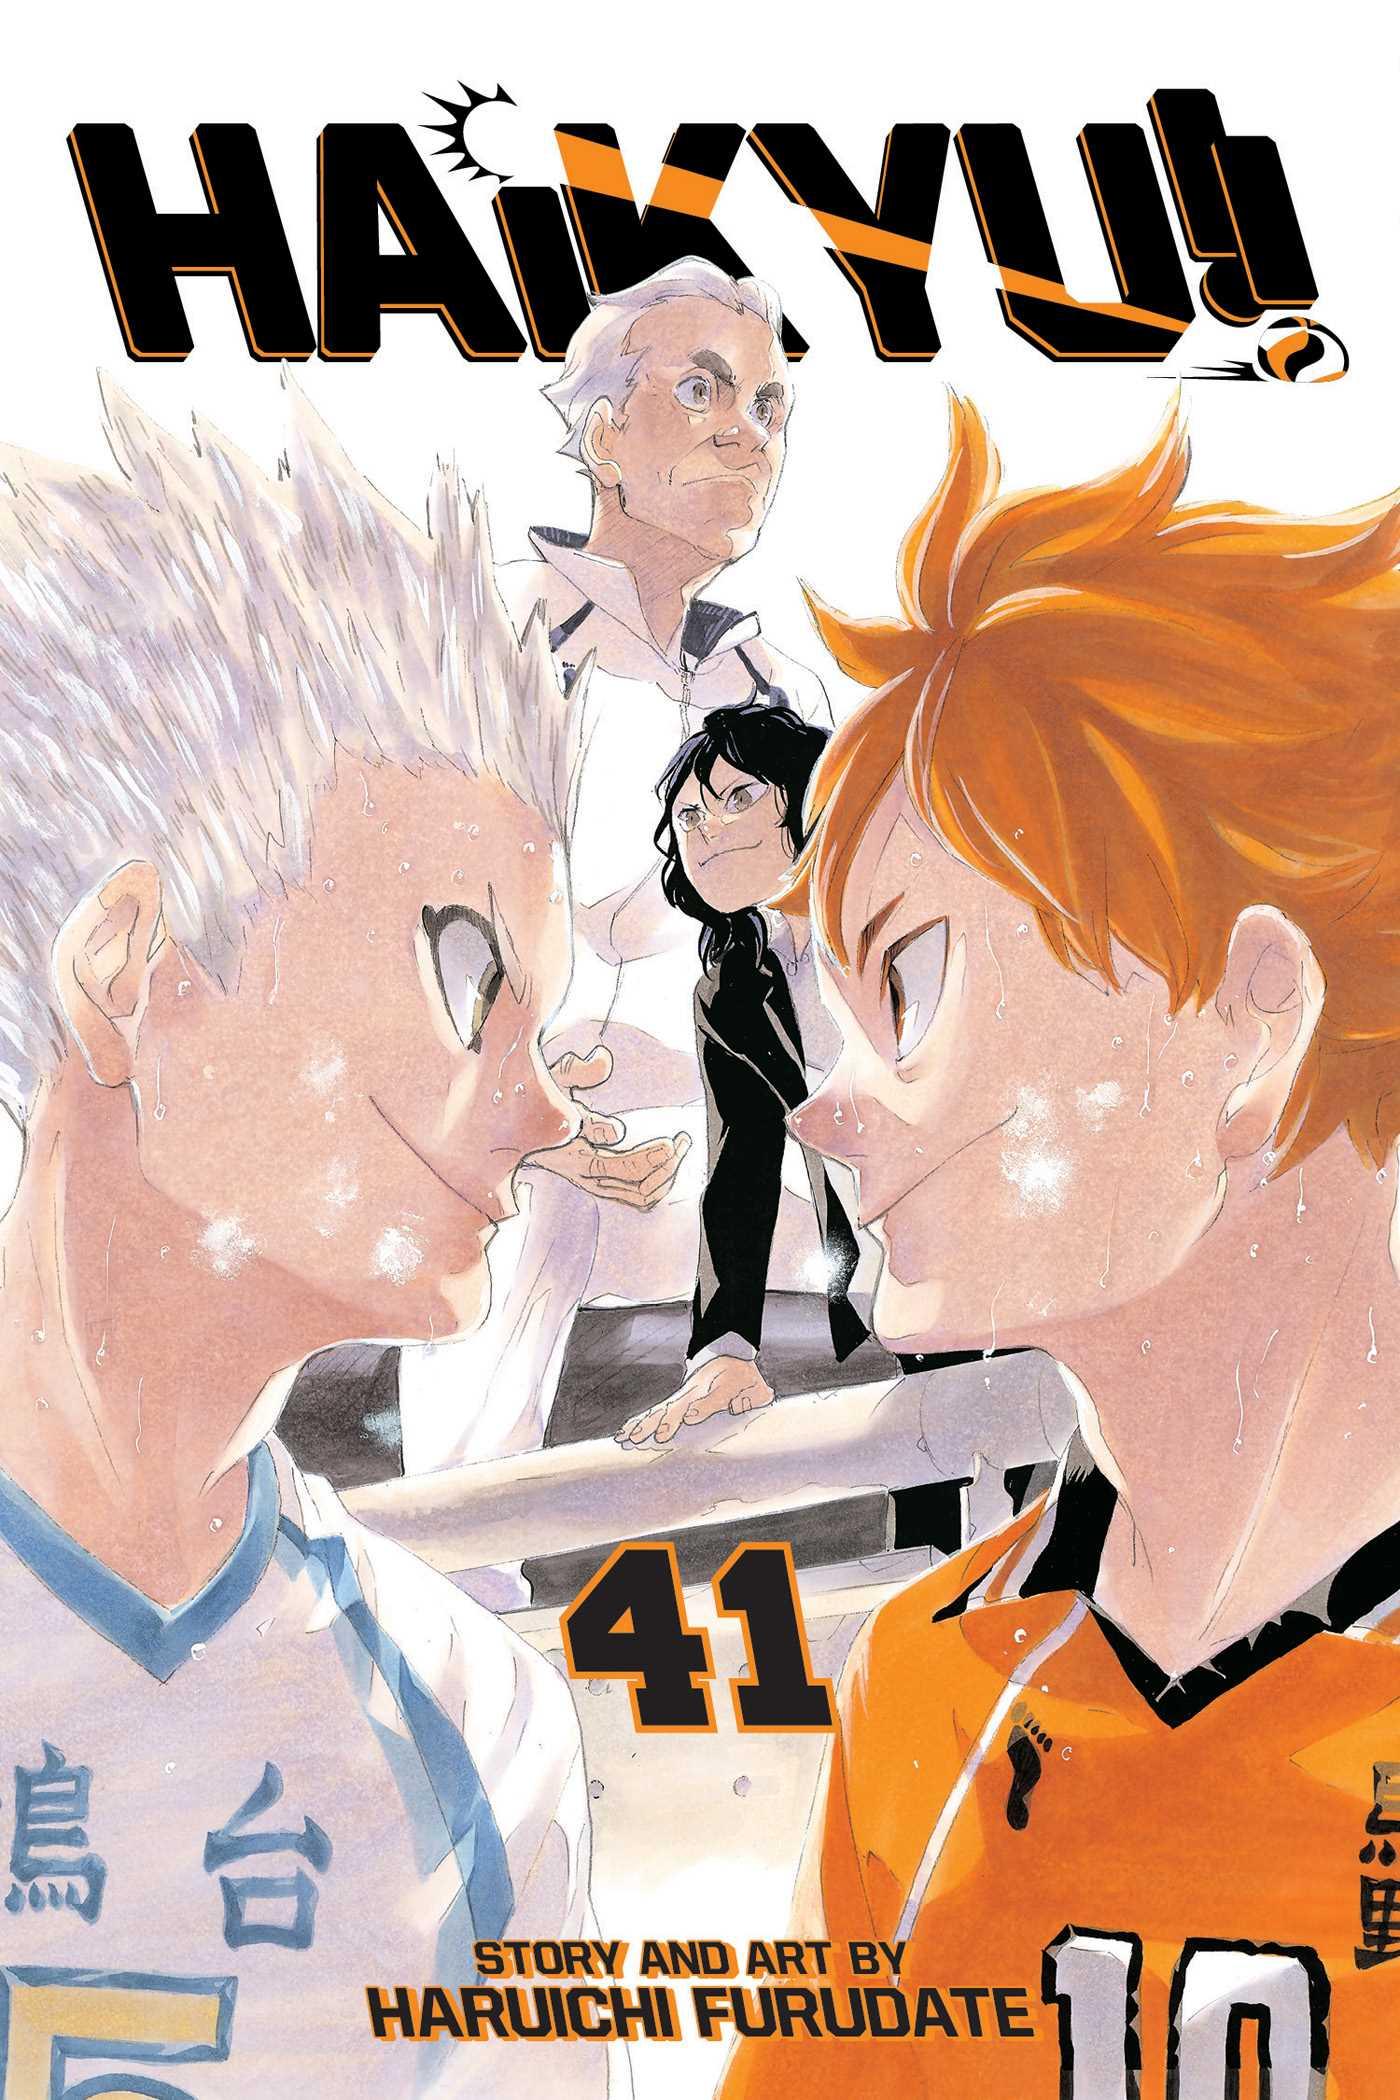 Haikyu!!, Vol. 41 by Haruichi Furudate